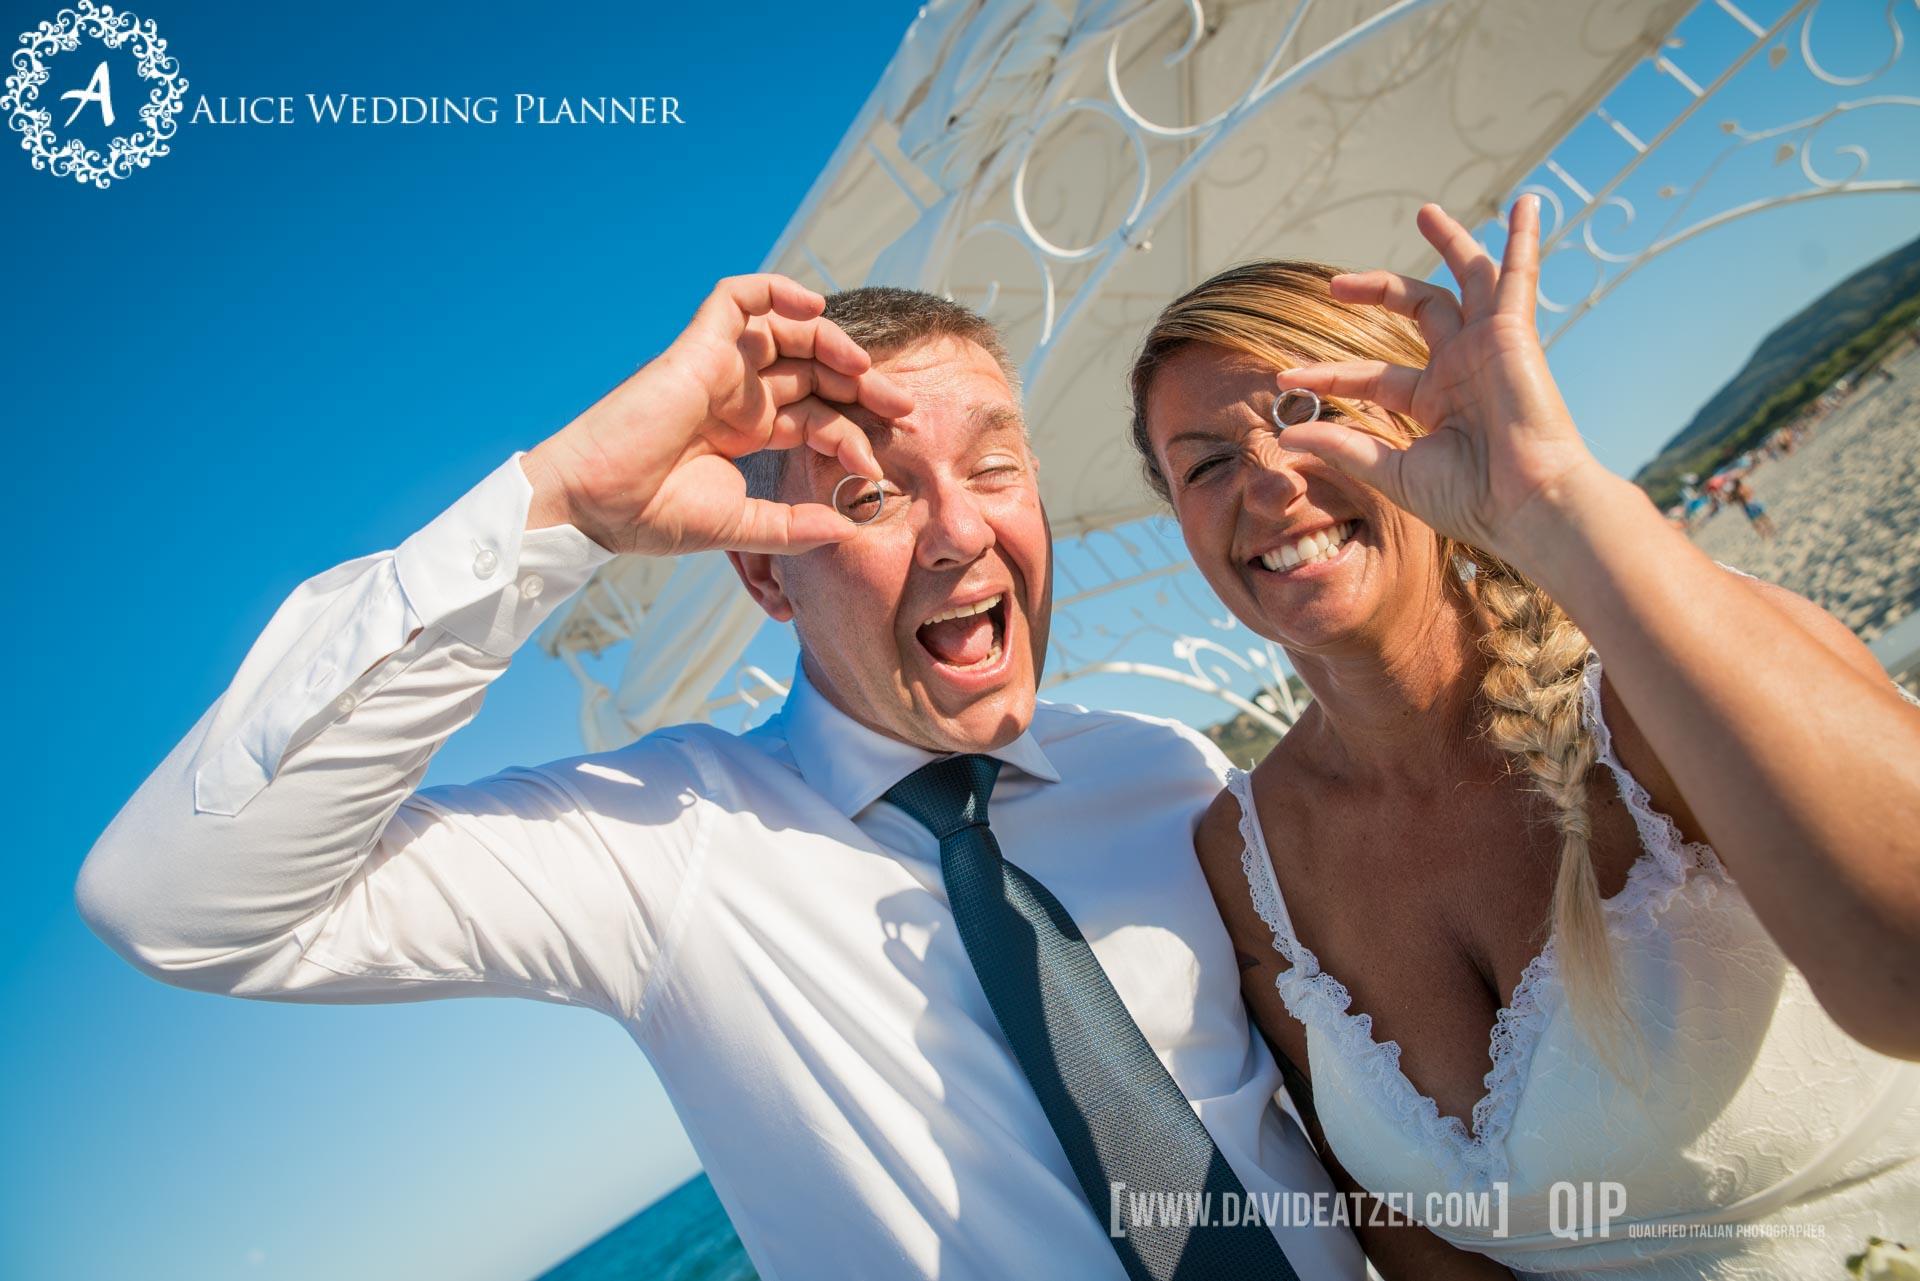 Wedding_CalaSinzias_Sardegna_AliceWeddingPlanner_love